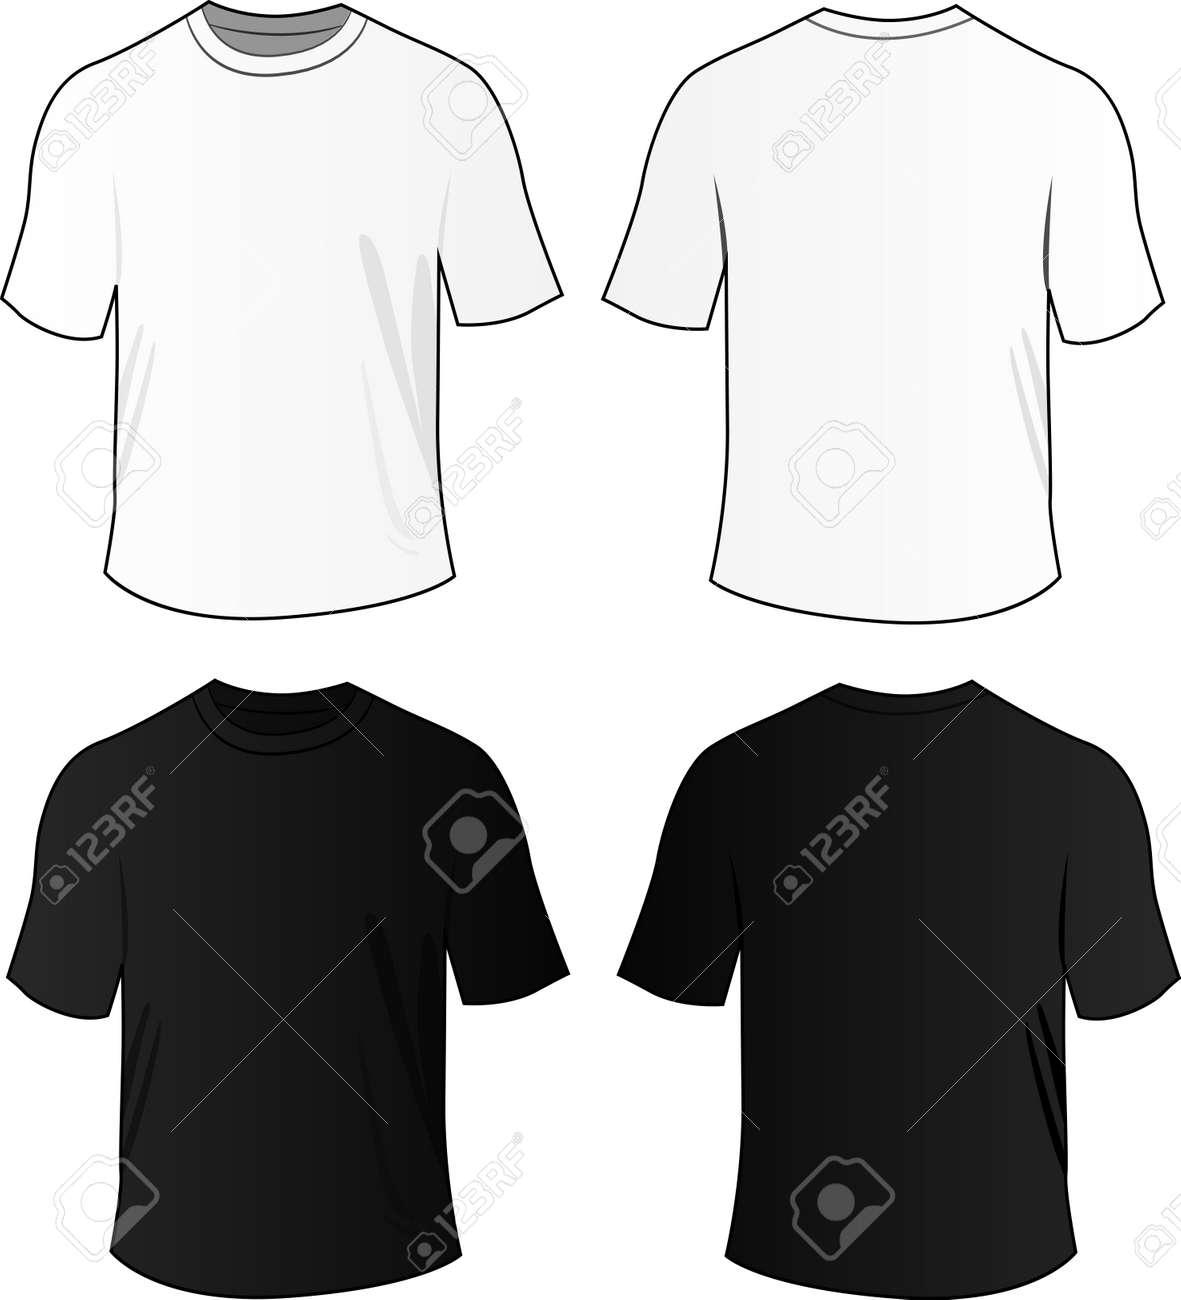 Black t shirt vector free - Black Tshirt Vector Illustration Of Black And White Blank Tee Shirts